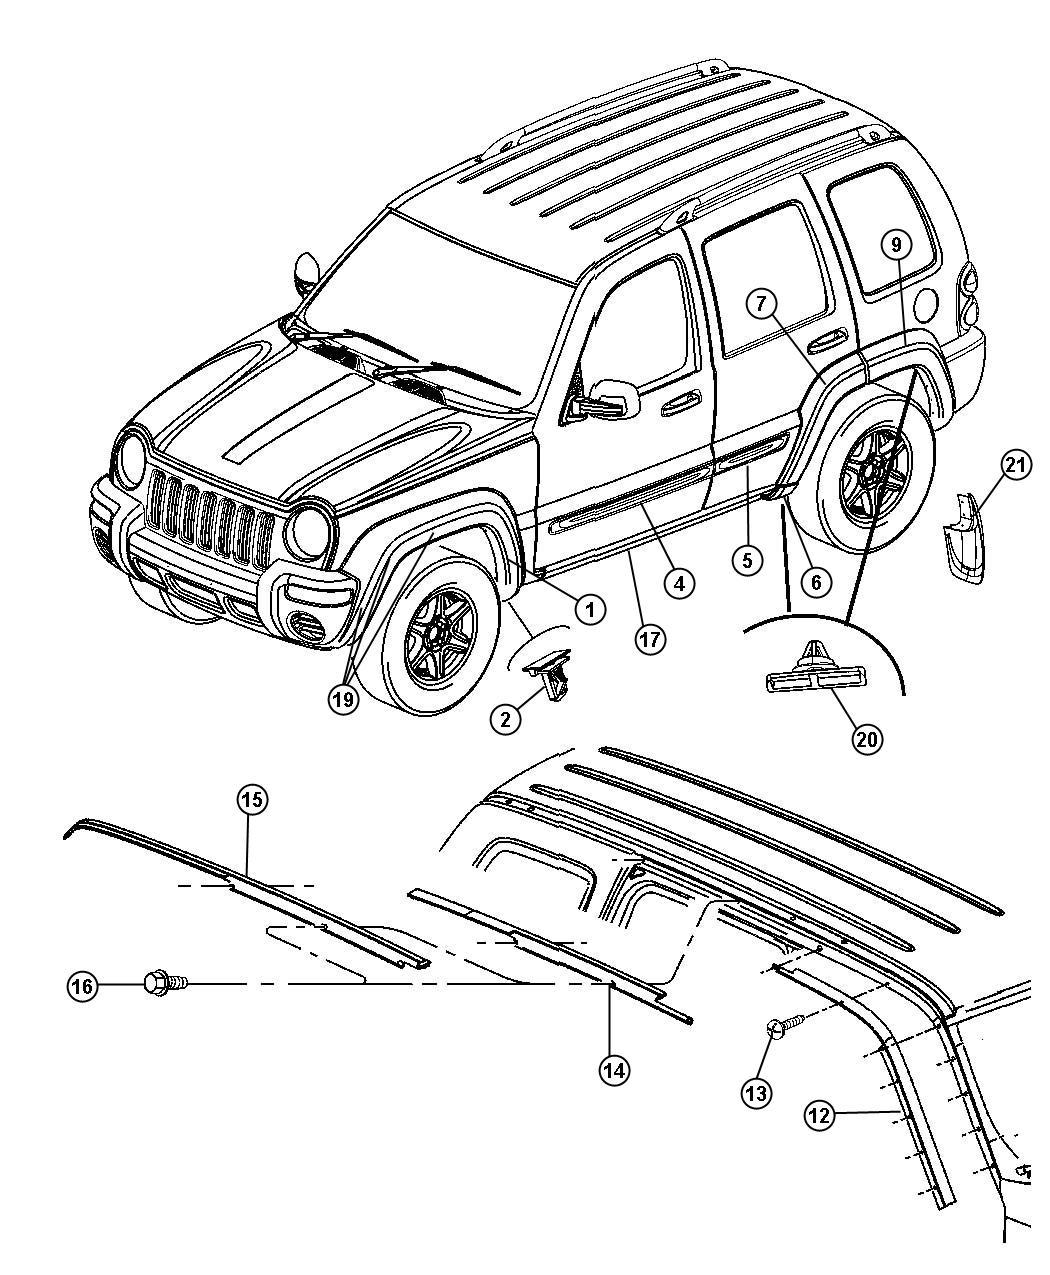 Jeep Liberty Fuel Filter